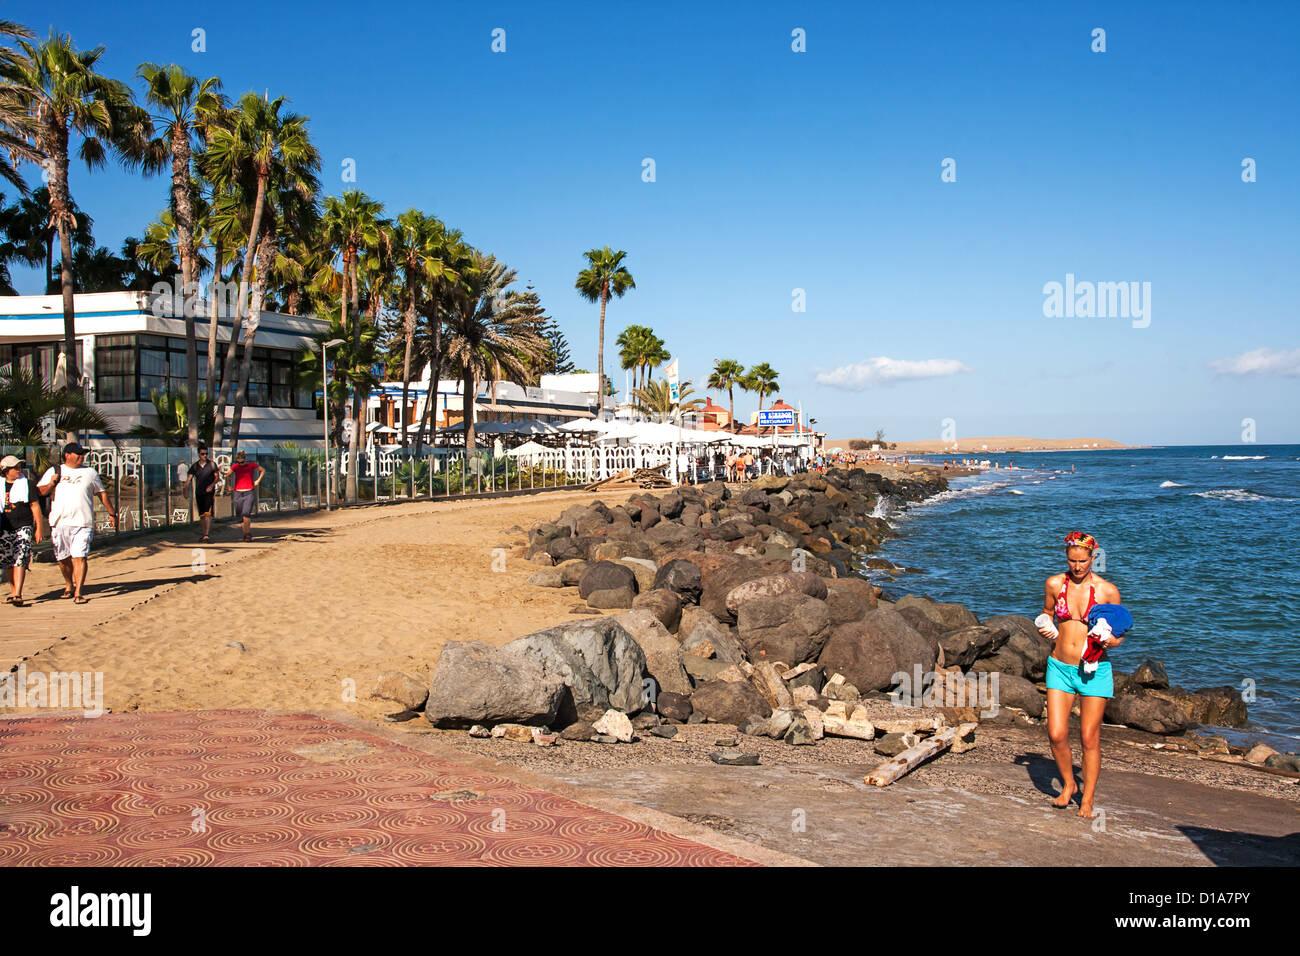 playa maspalomas restaurantes